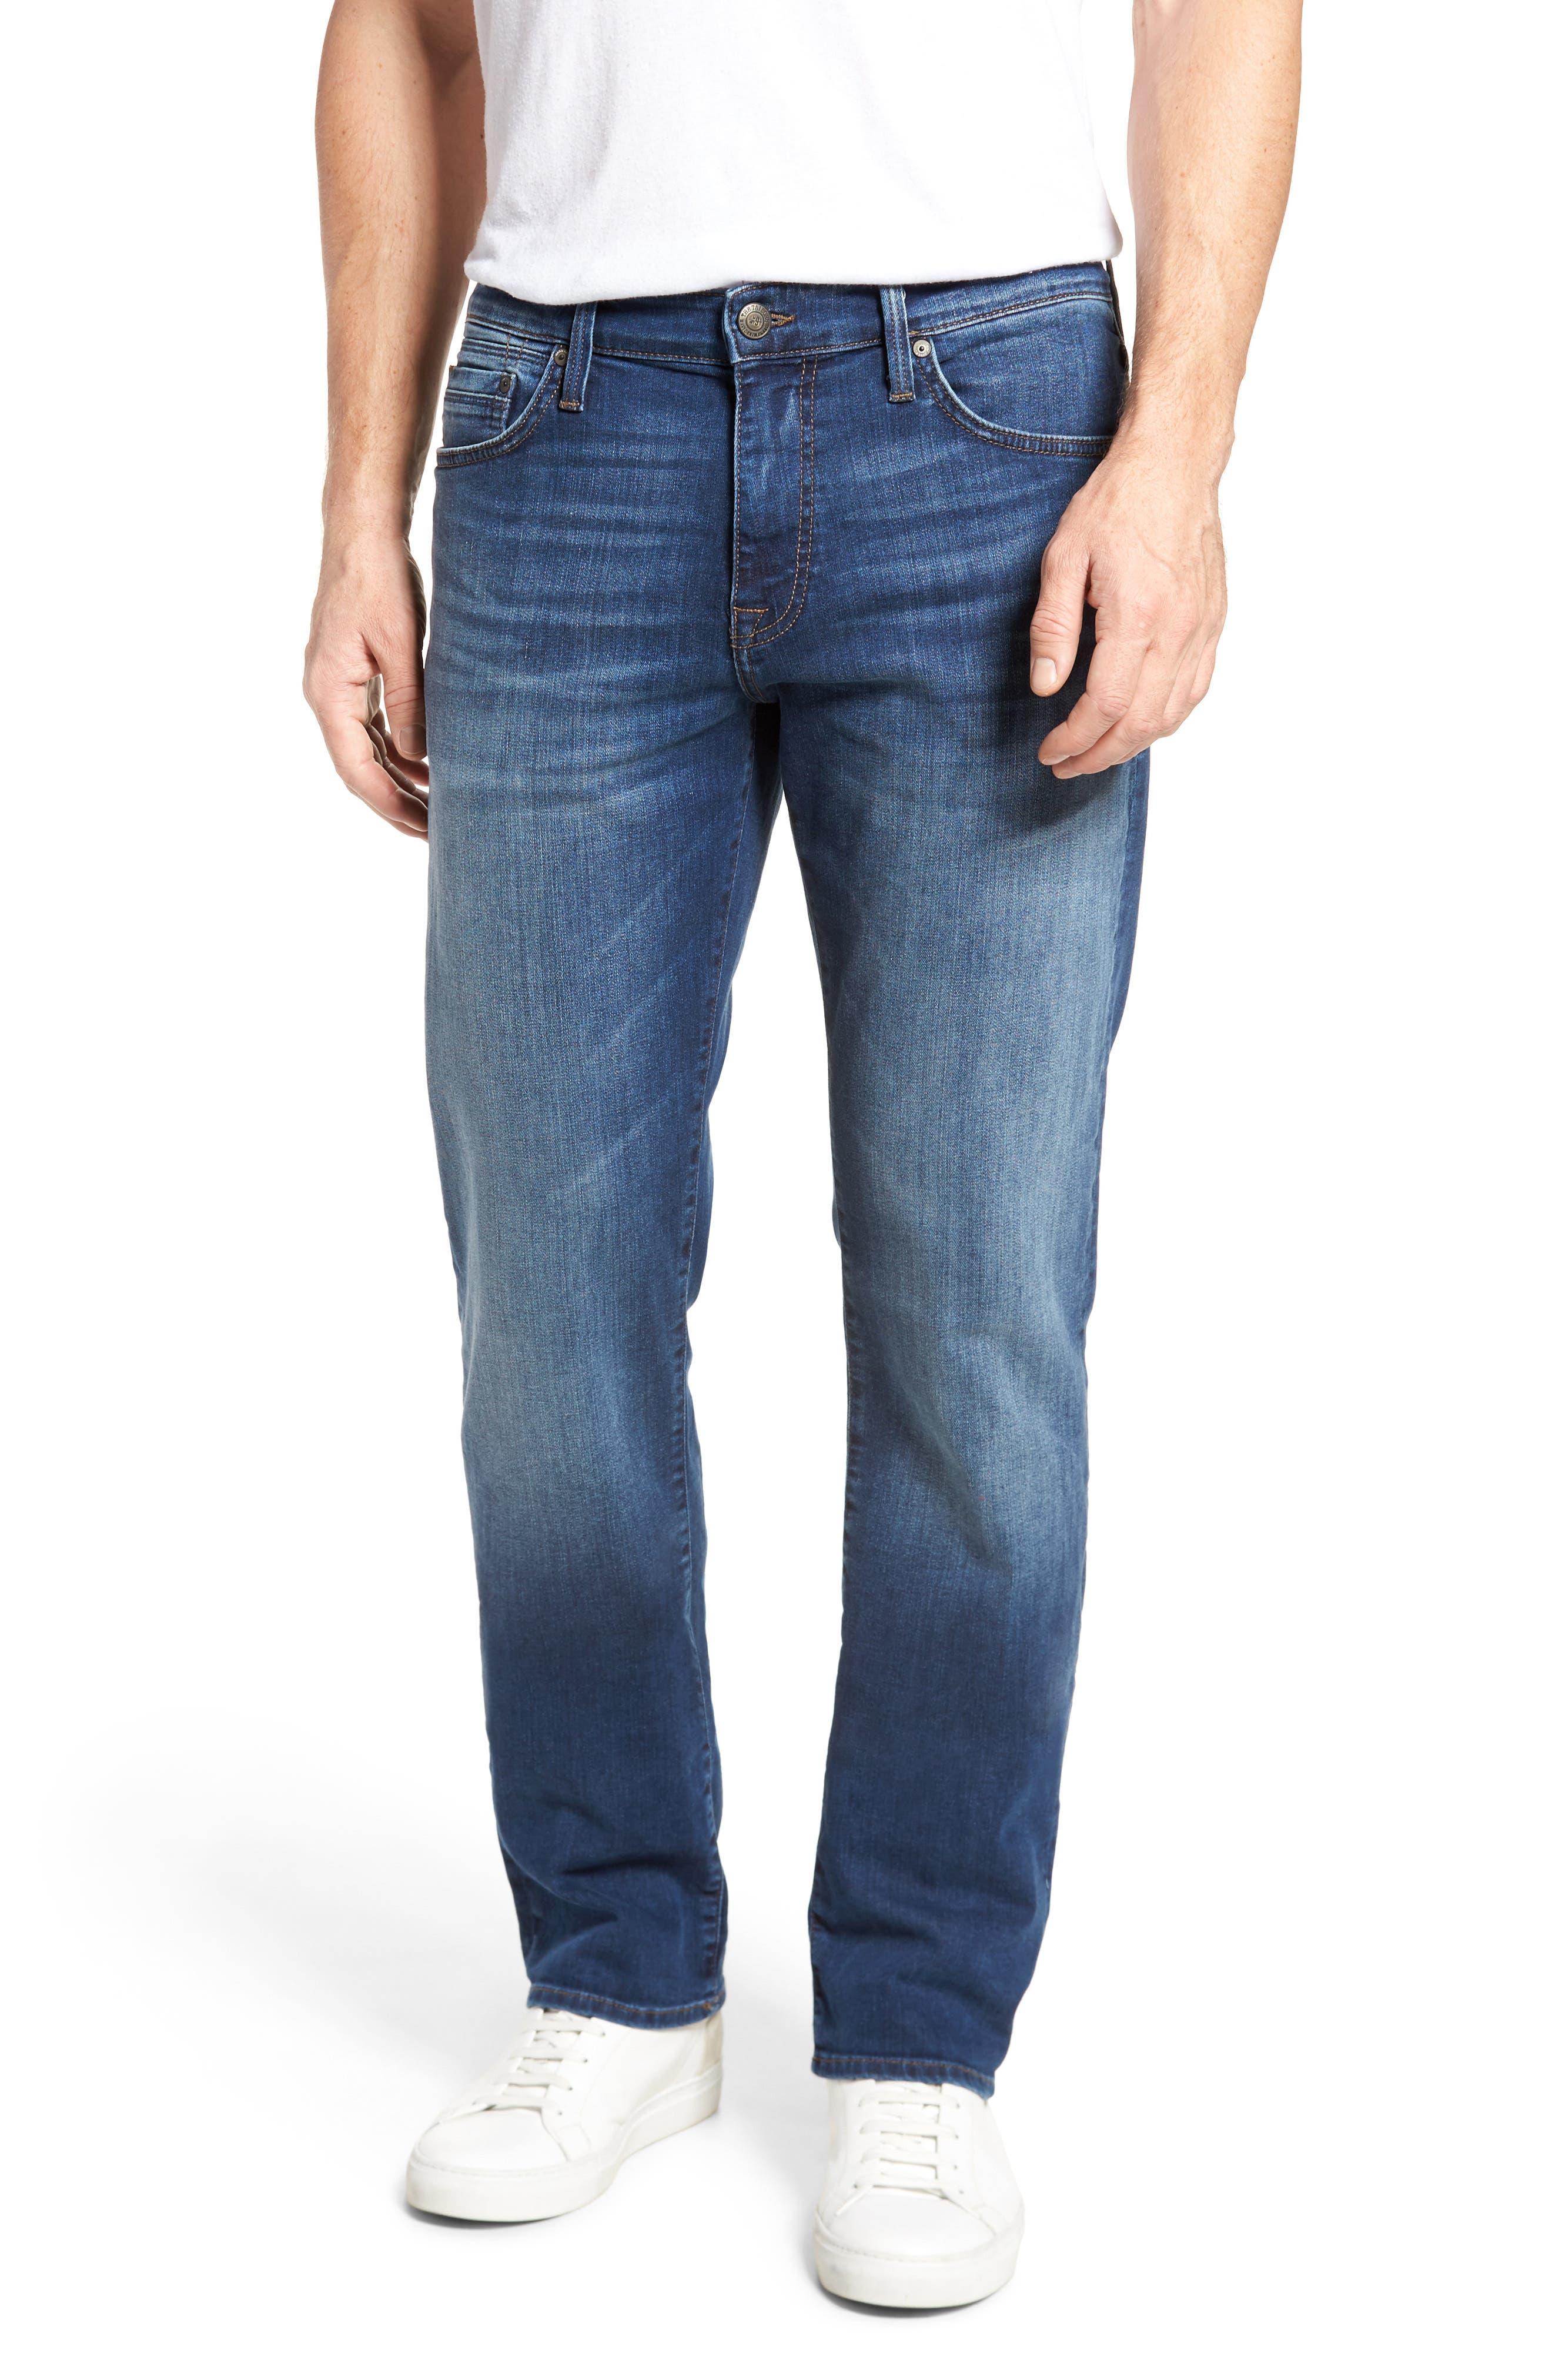 Myles Straight Fit Jeans,                         Main,                         color, Dark Used Williamsburg